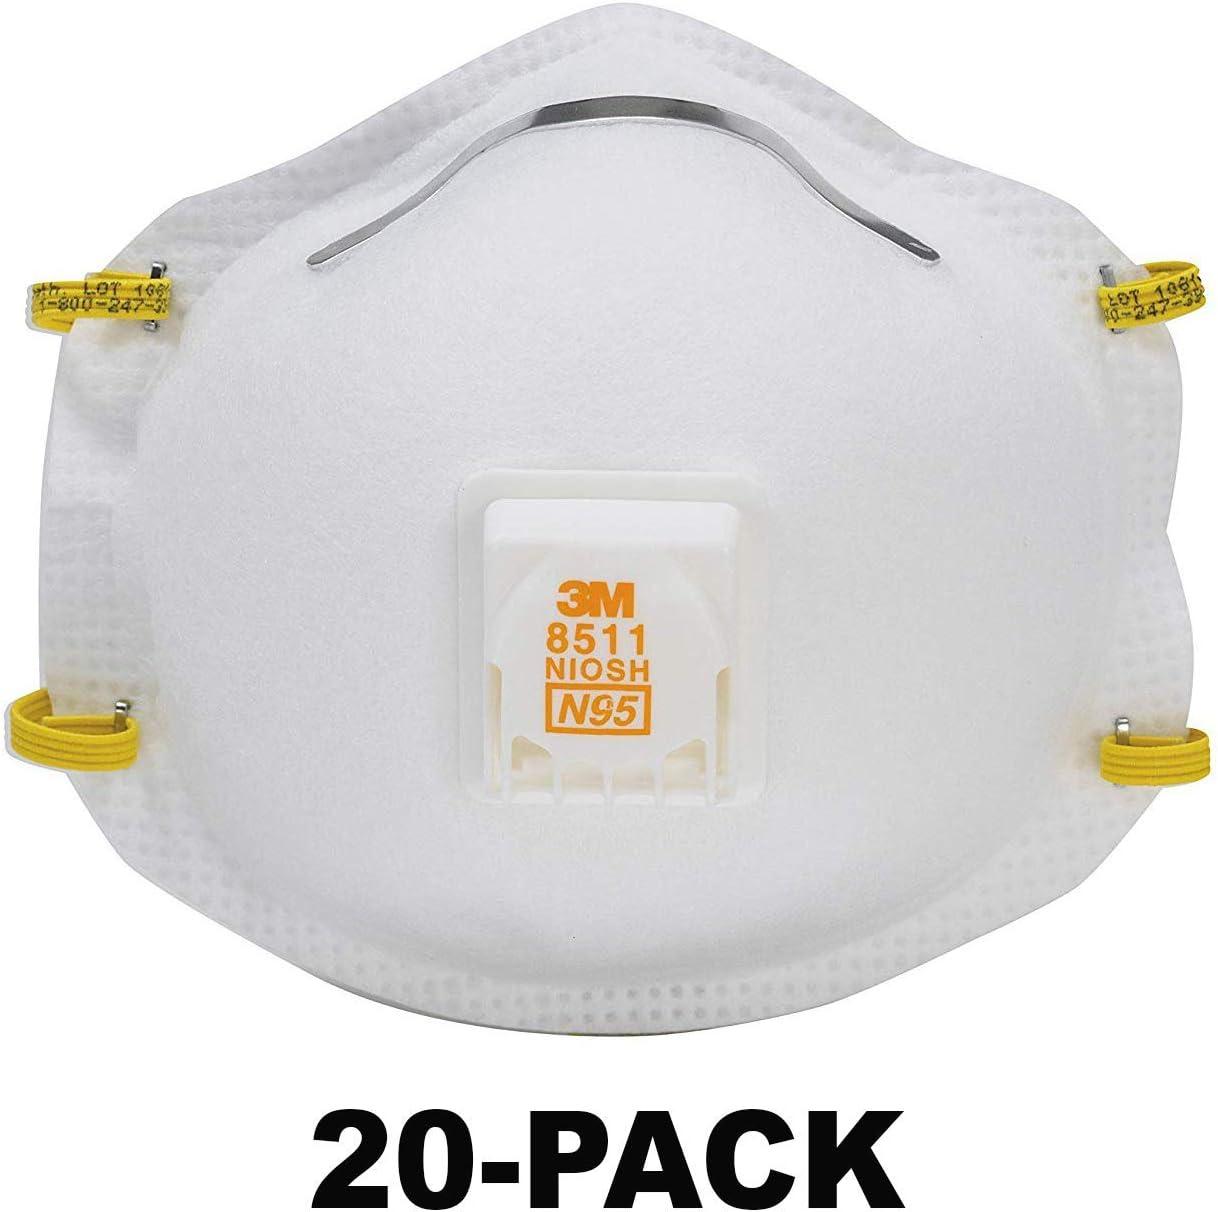 3m 8511 n95 respirator mask - 10 pack